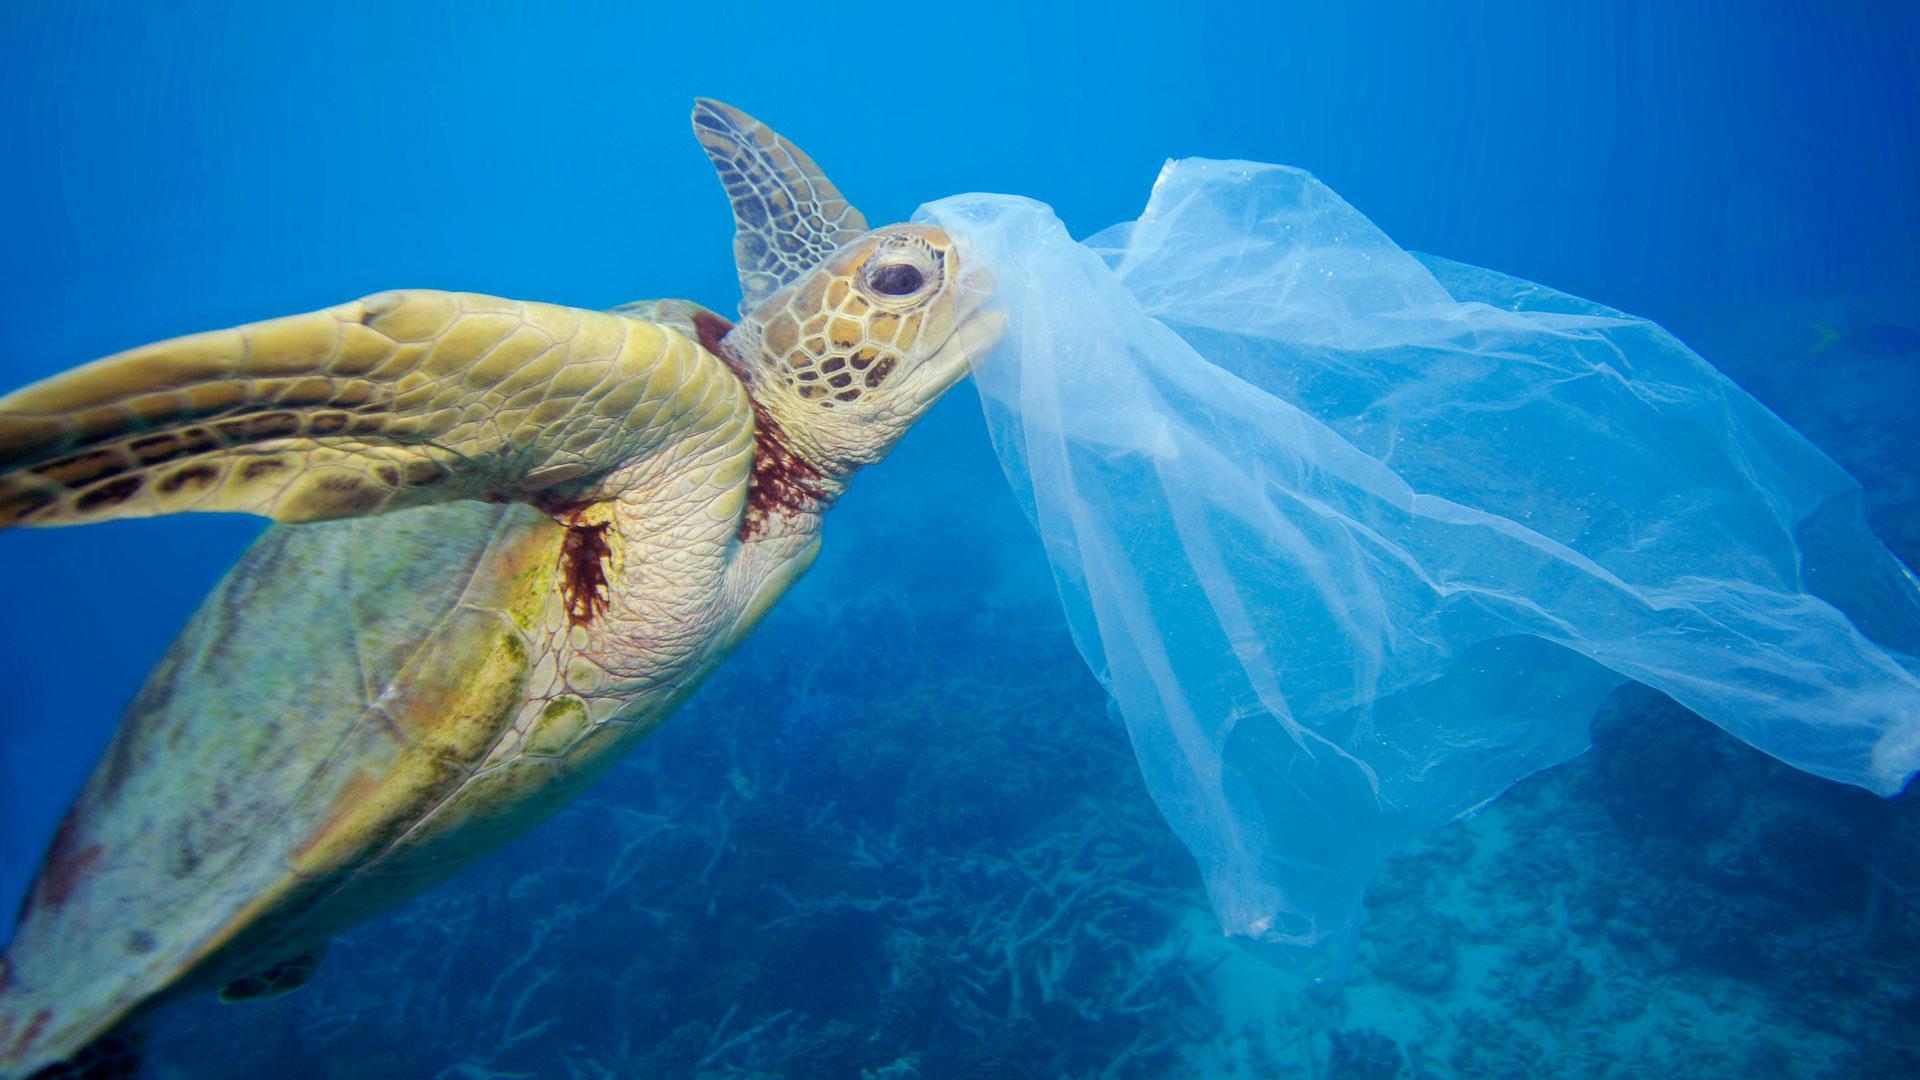 Meeresschildkröte (Cheloniidae) mit Plastiktüte